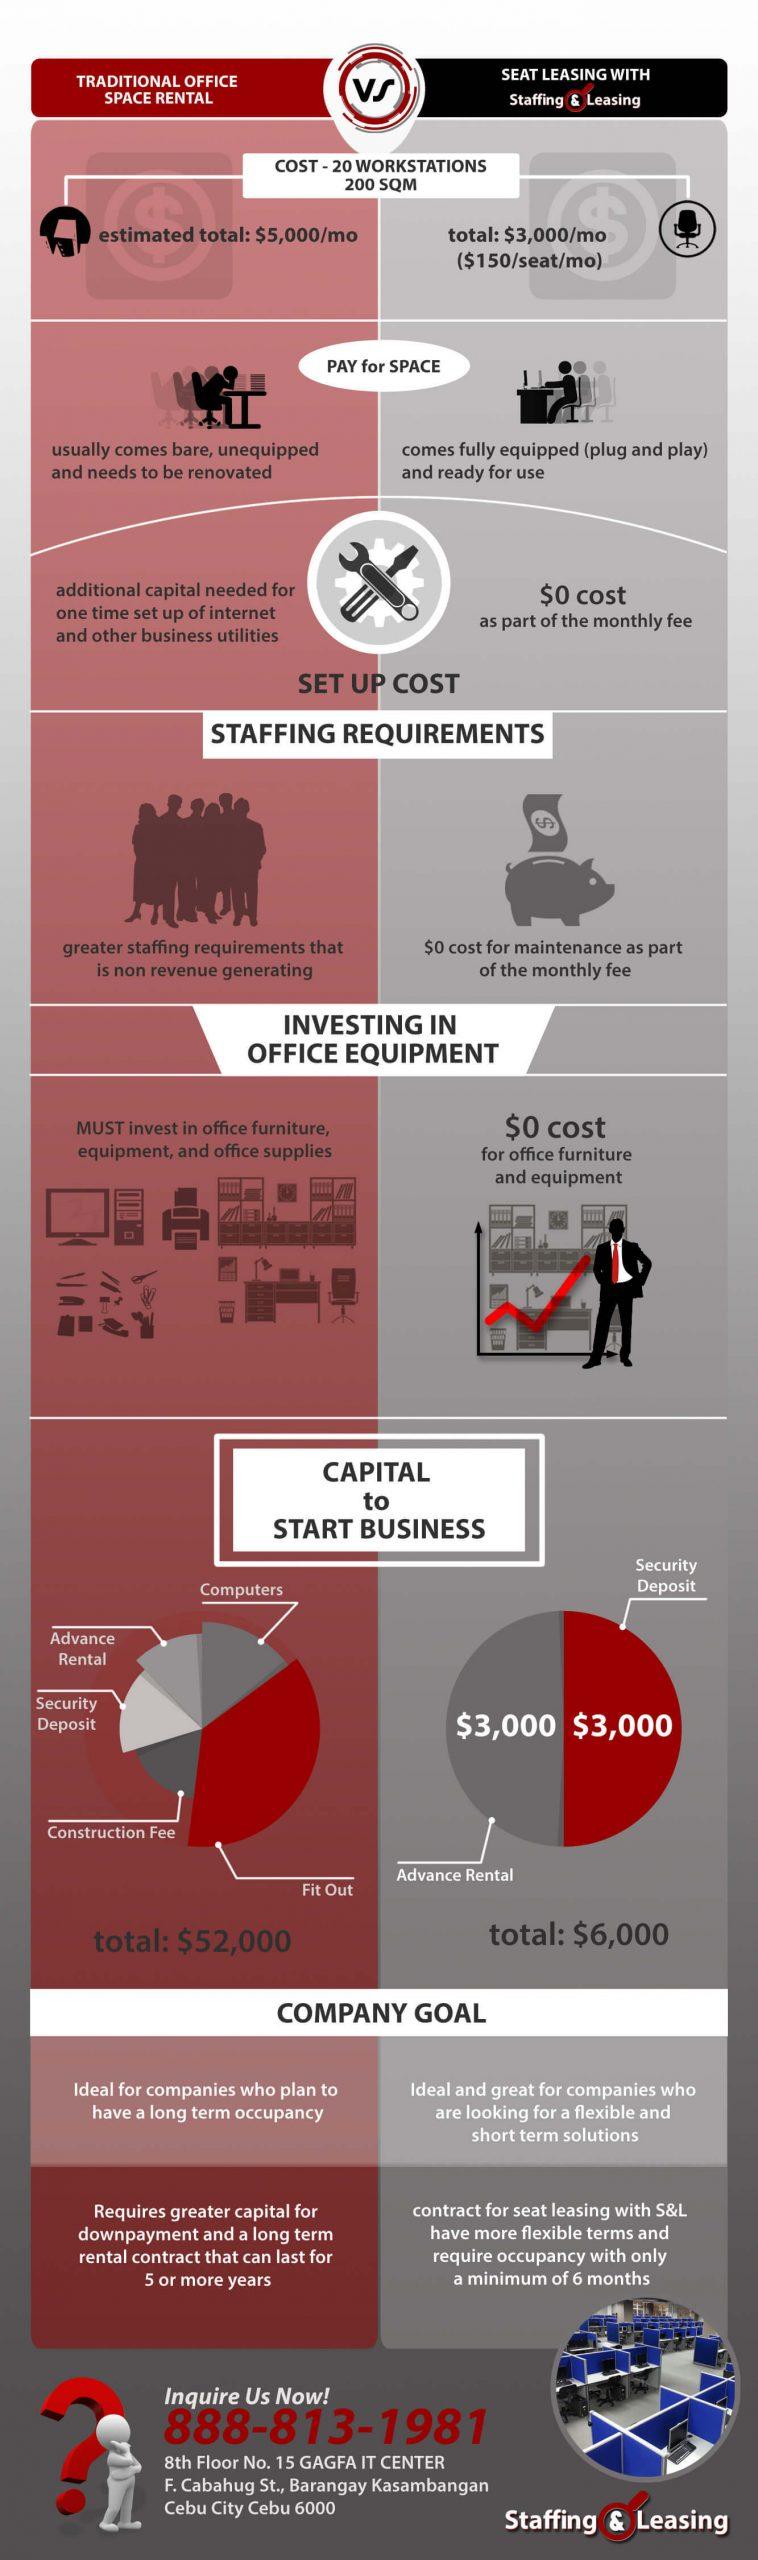 SL Seat Leasing Comparison Infographic